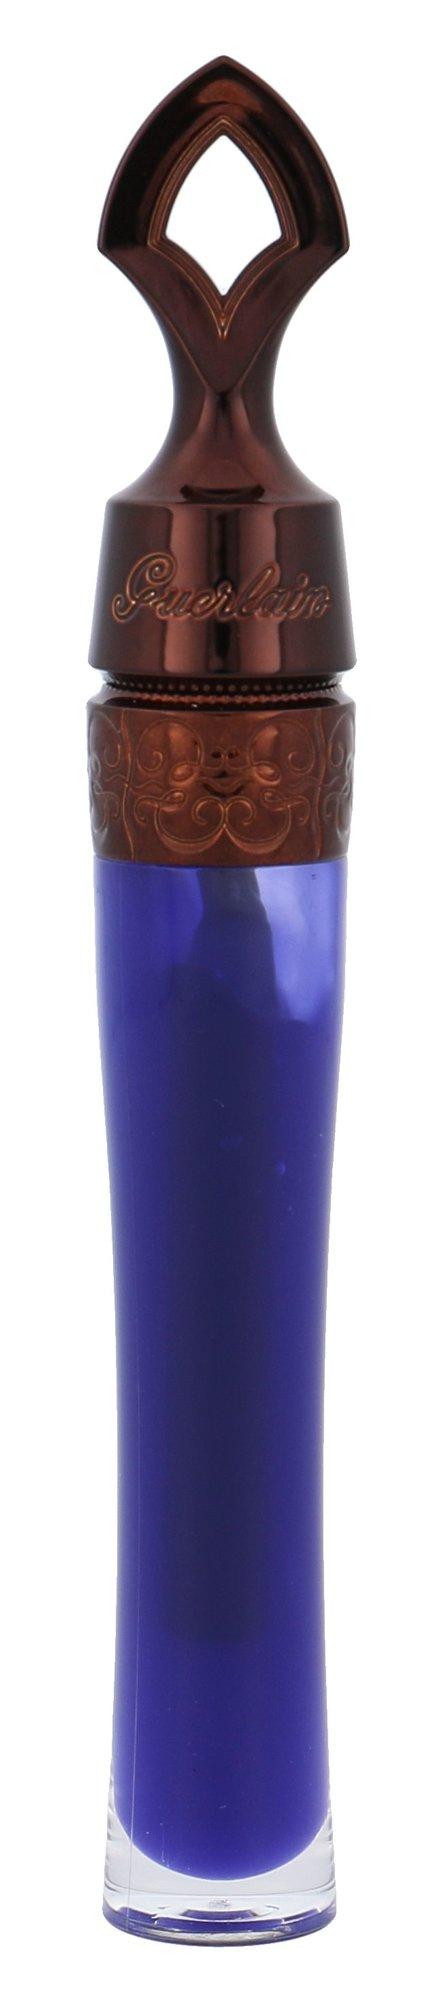 Guerlain Terracotta Cosmetic 5ml 12 Porto Azzurro